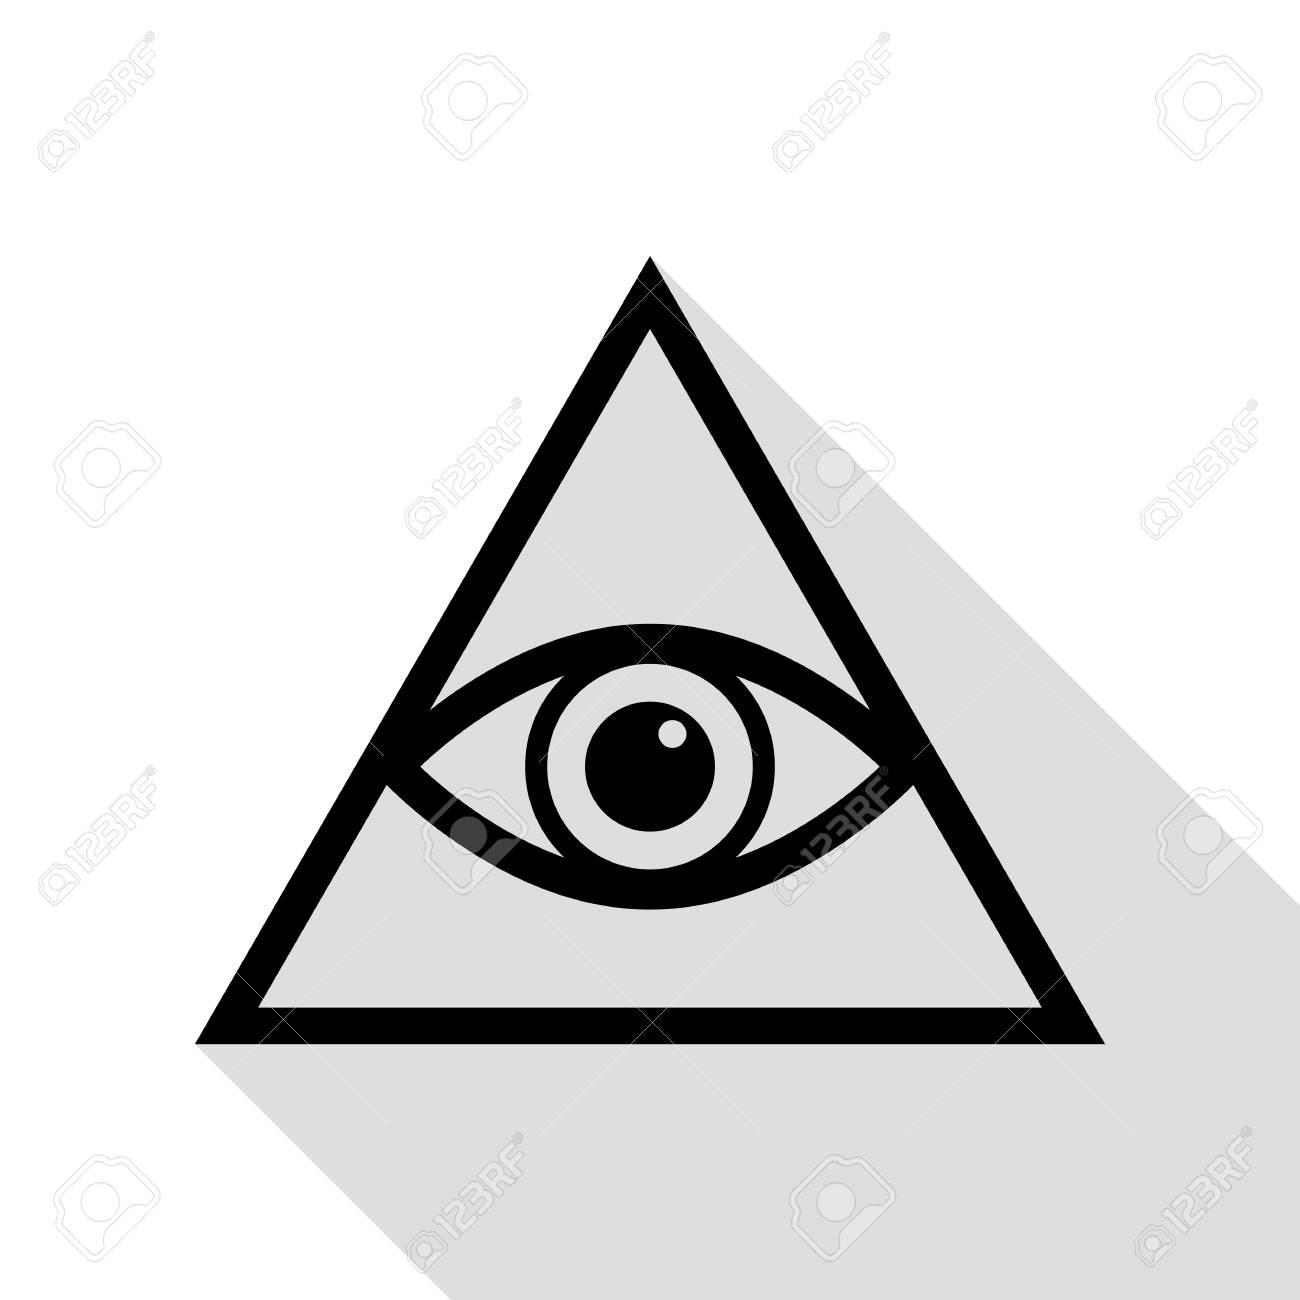 All Seeing Eye Pyramid Symbol Freemason And Spiritual Black Icon With Flat Style Shadow